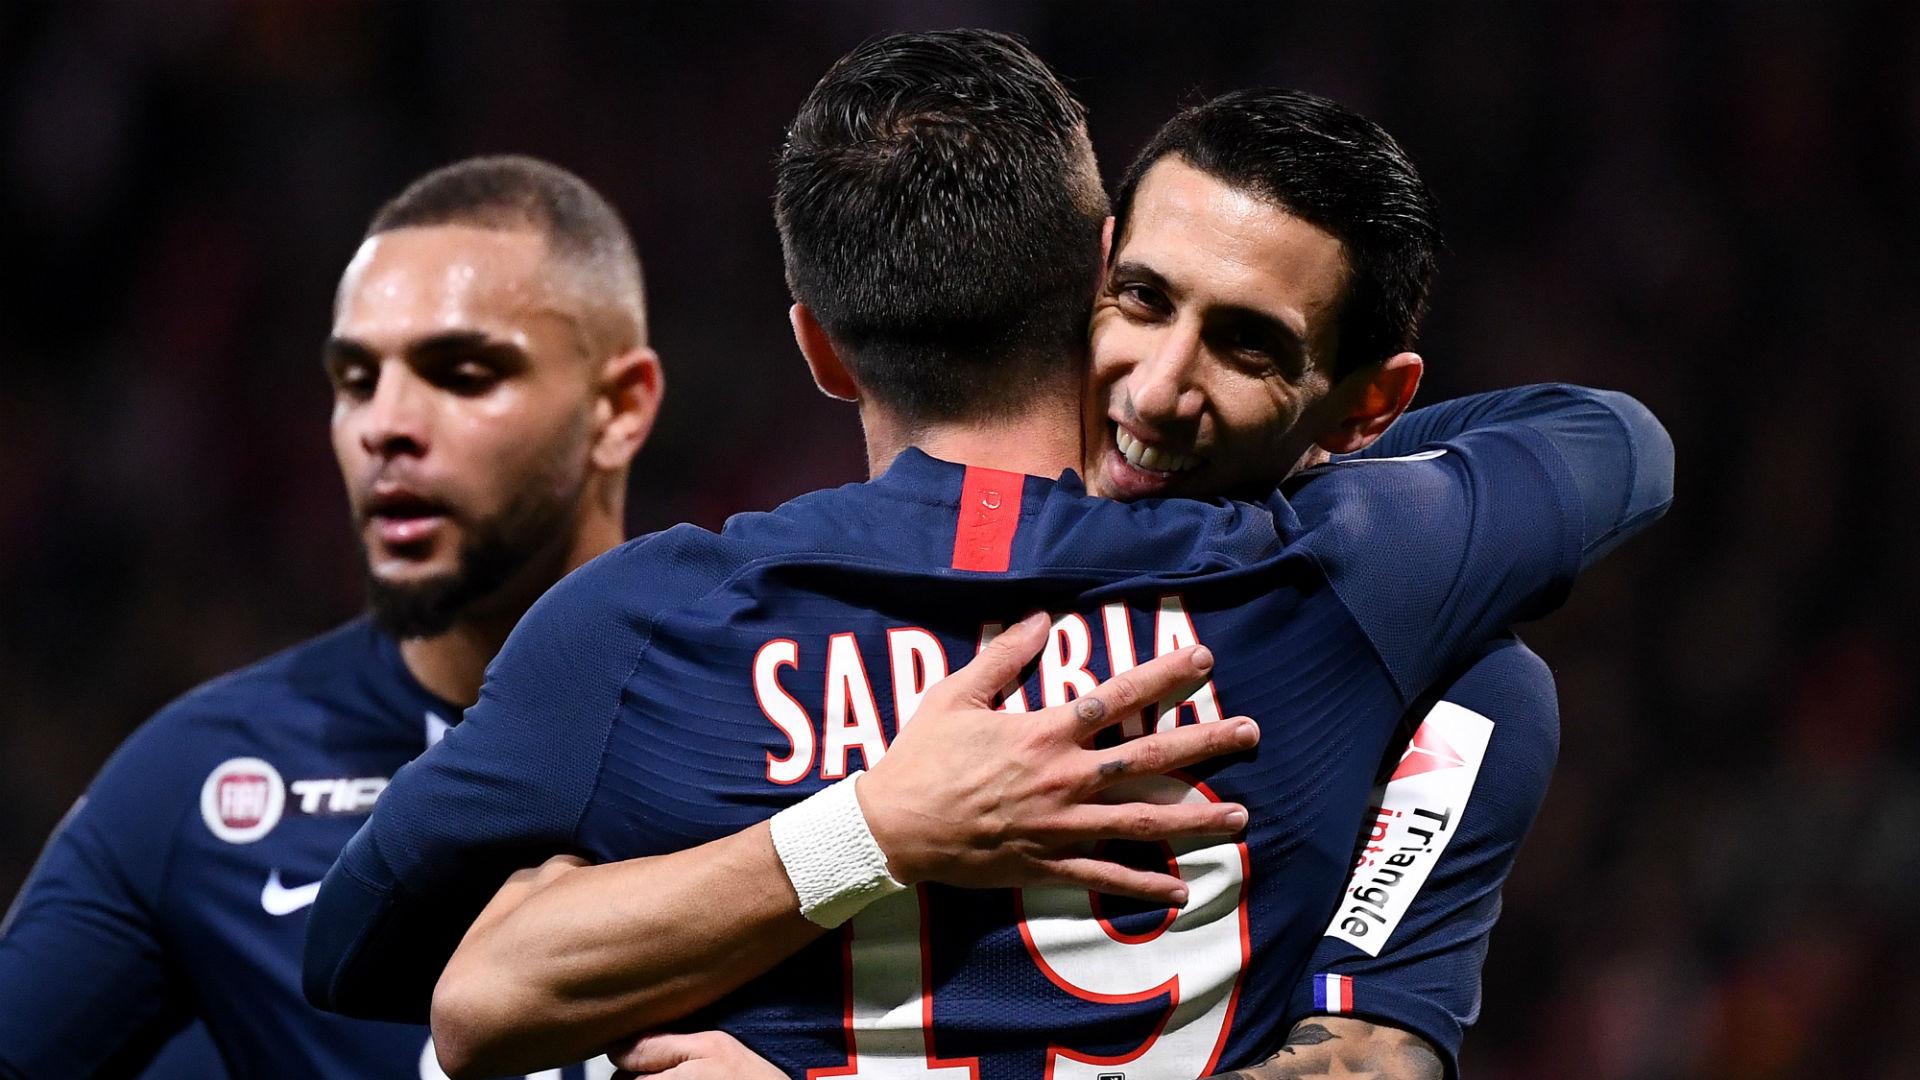 Lorient 0-1 Paris Saint-Germain: Late Sarabia header sends PSG into last 16